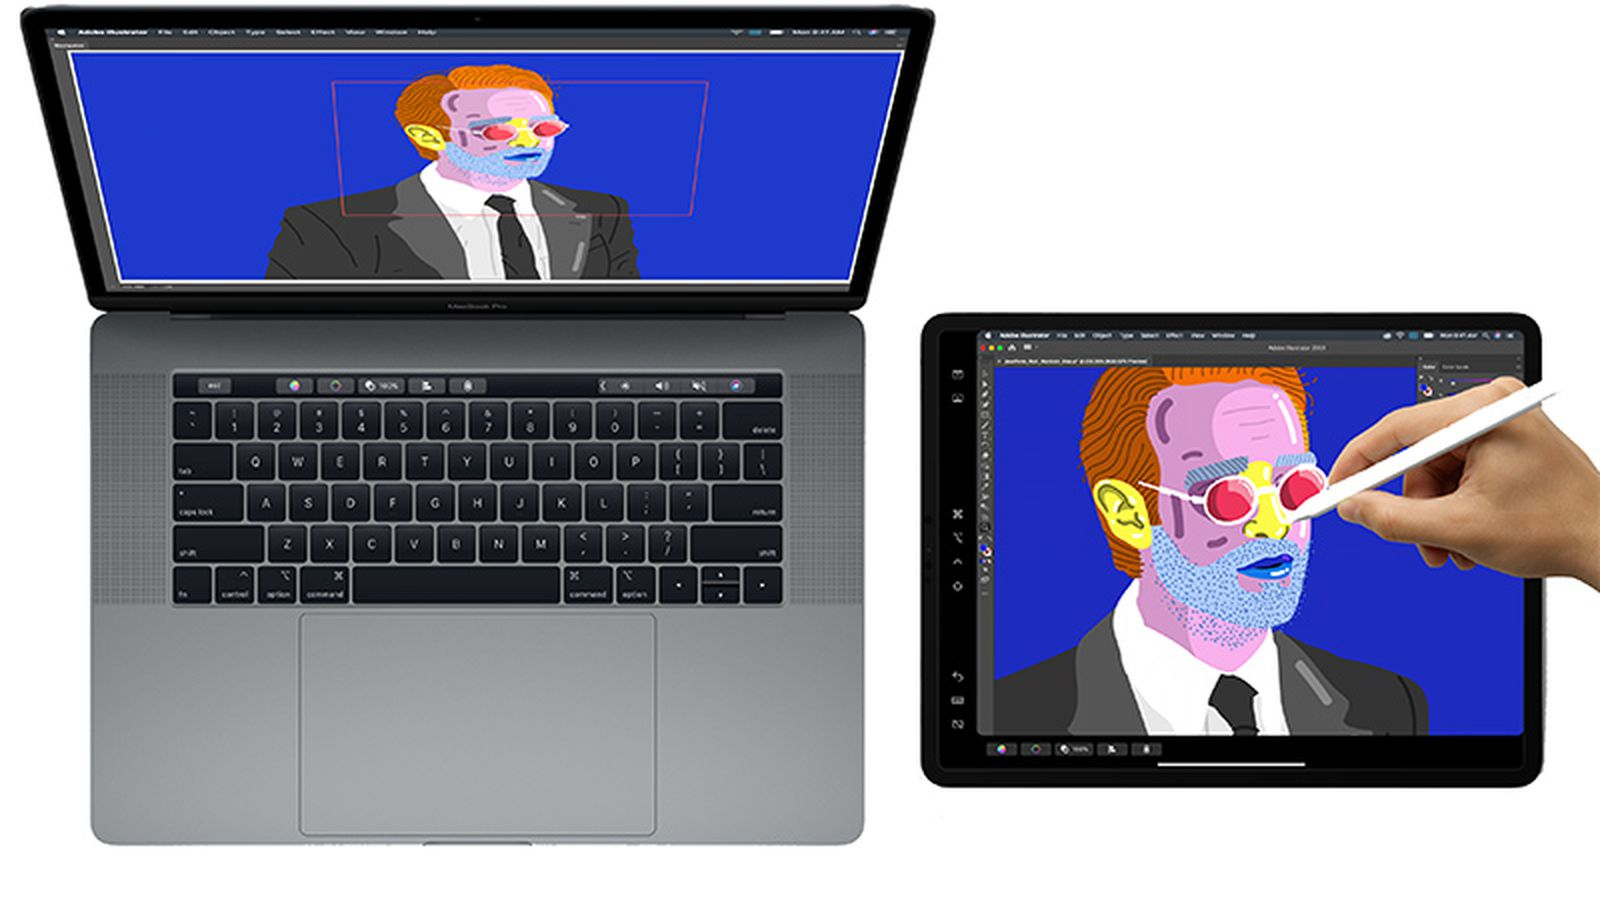 Sidecar: Turn an iPad Into a Secondary Mac Display - MacRumors